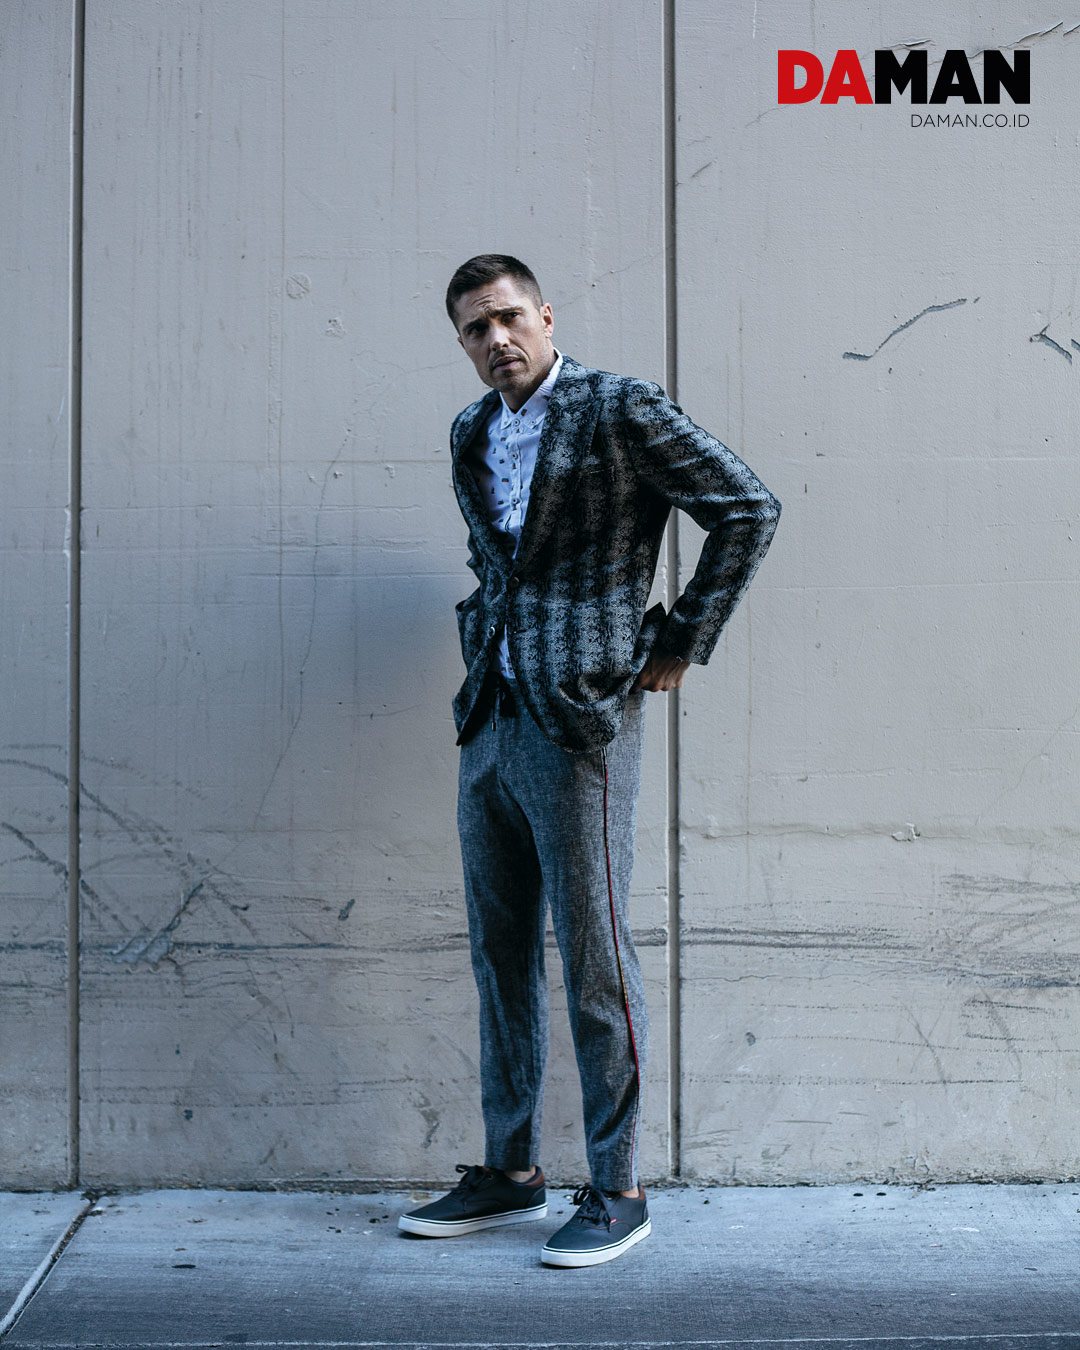 Blazer by William Kei, shirt by Soulstar, pants by Oren kash